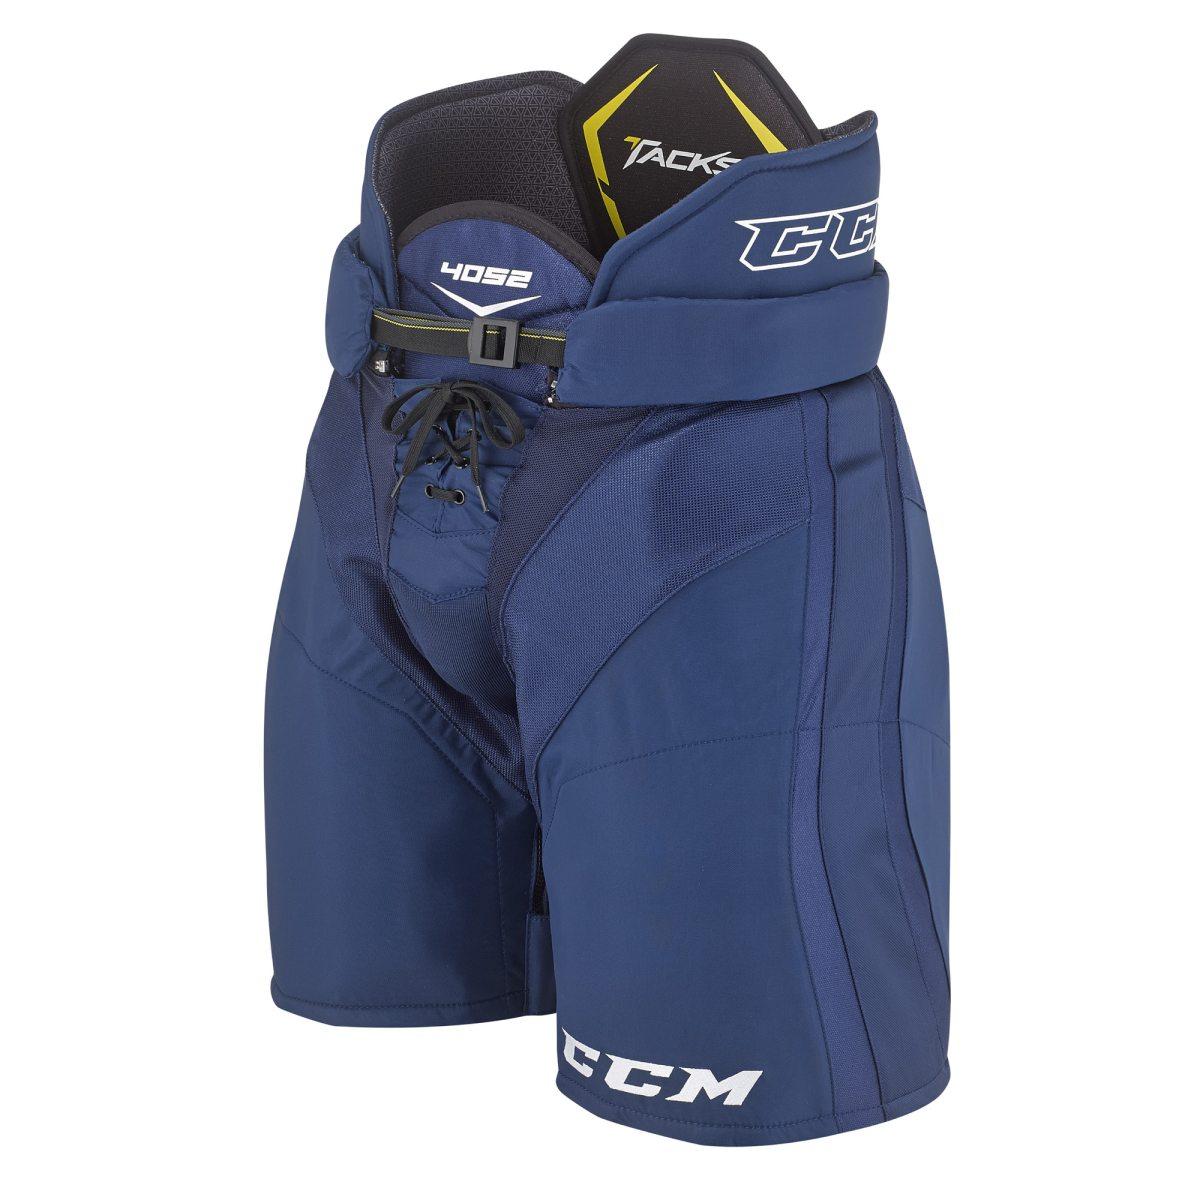 marin blå ccm hockey pant tacks 4052 hockeybyxa senior byxor 9eb8b18d23d91